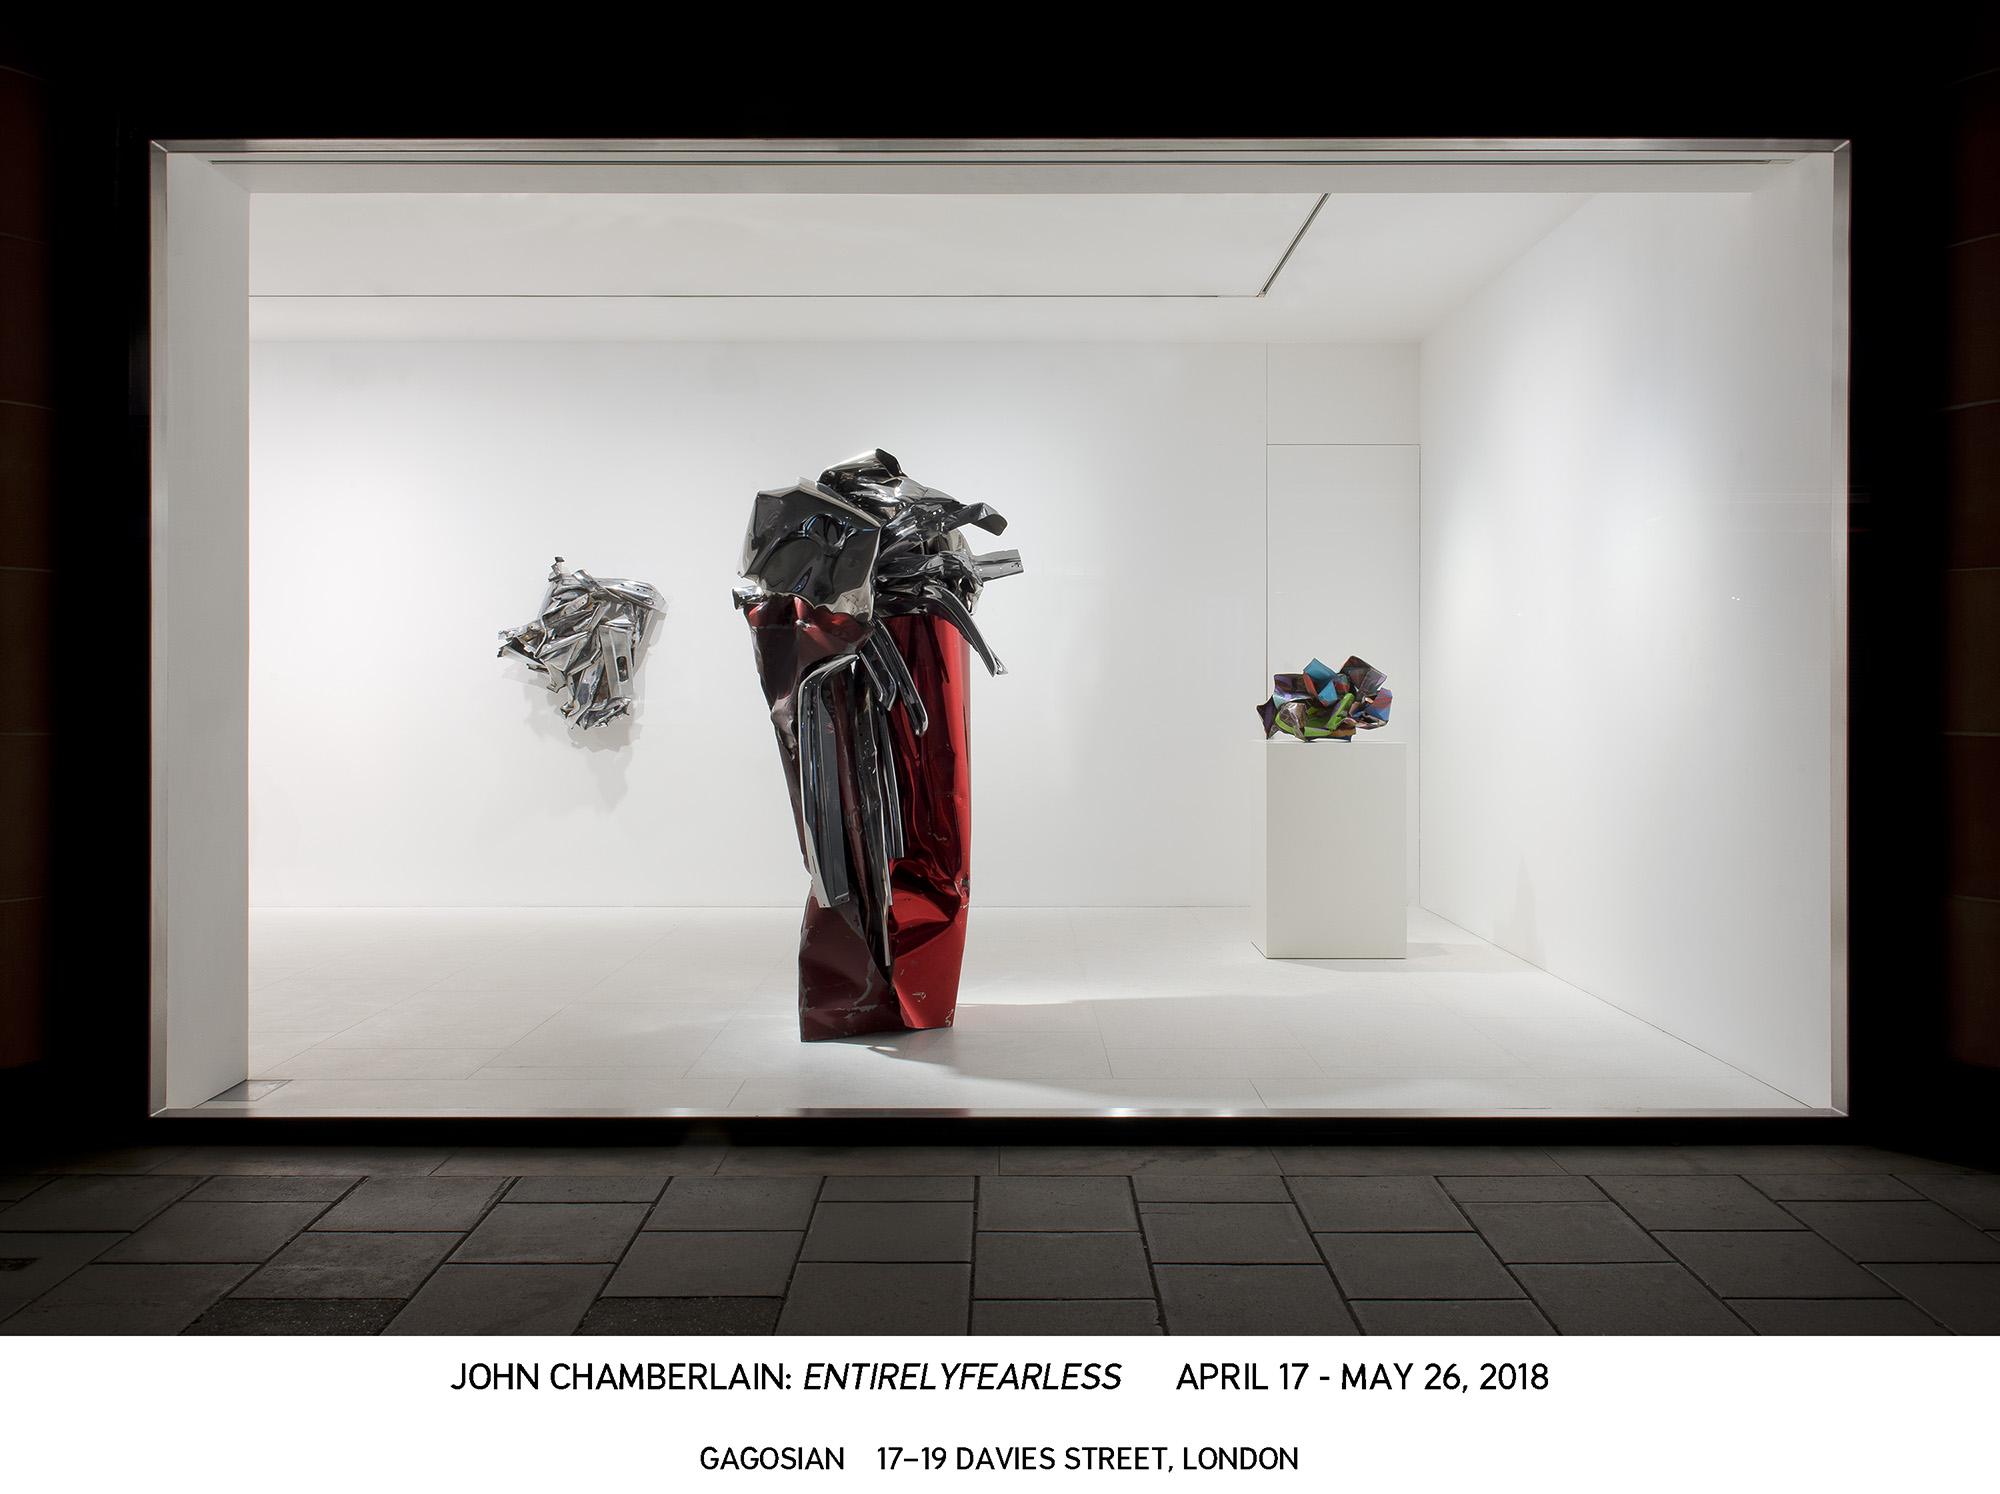 CHAMBERLAIN 2018 ENTIRELYFEARLESS Exterior view 3.jpg